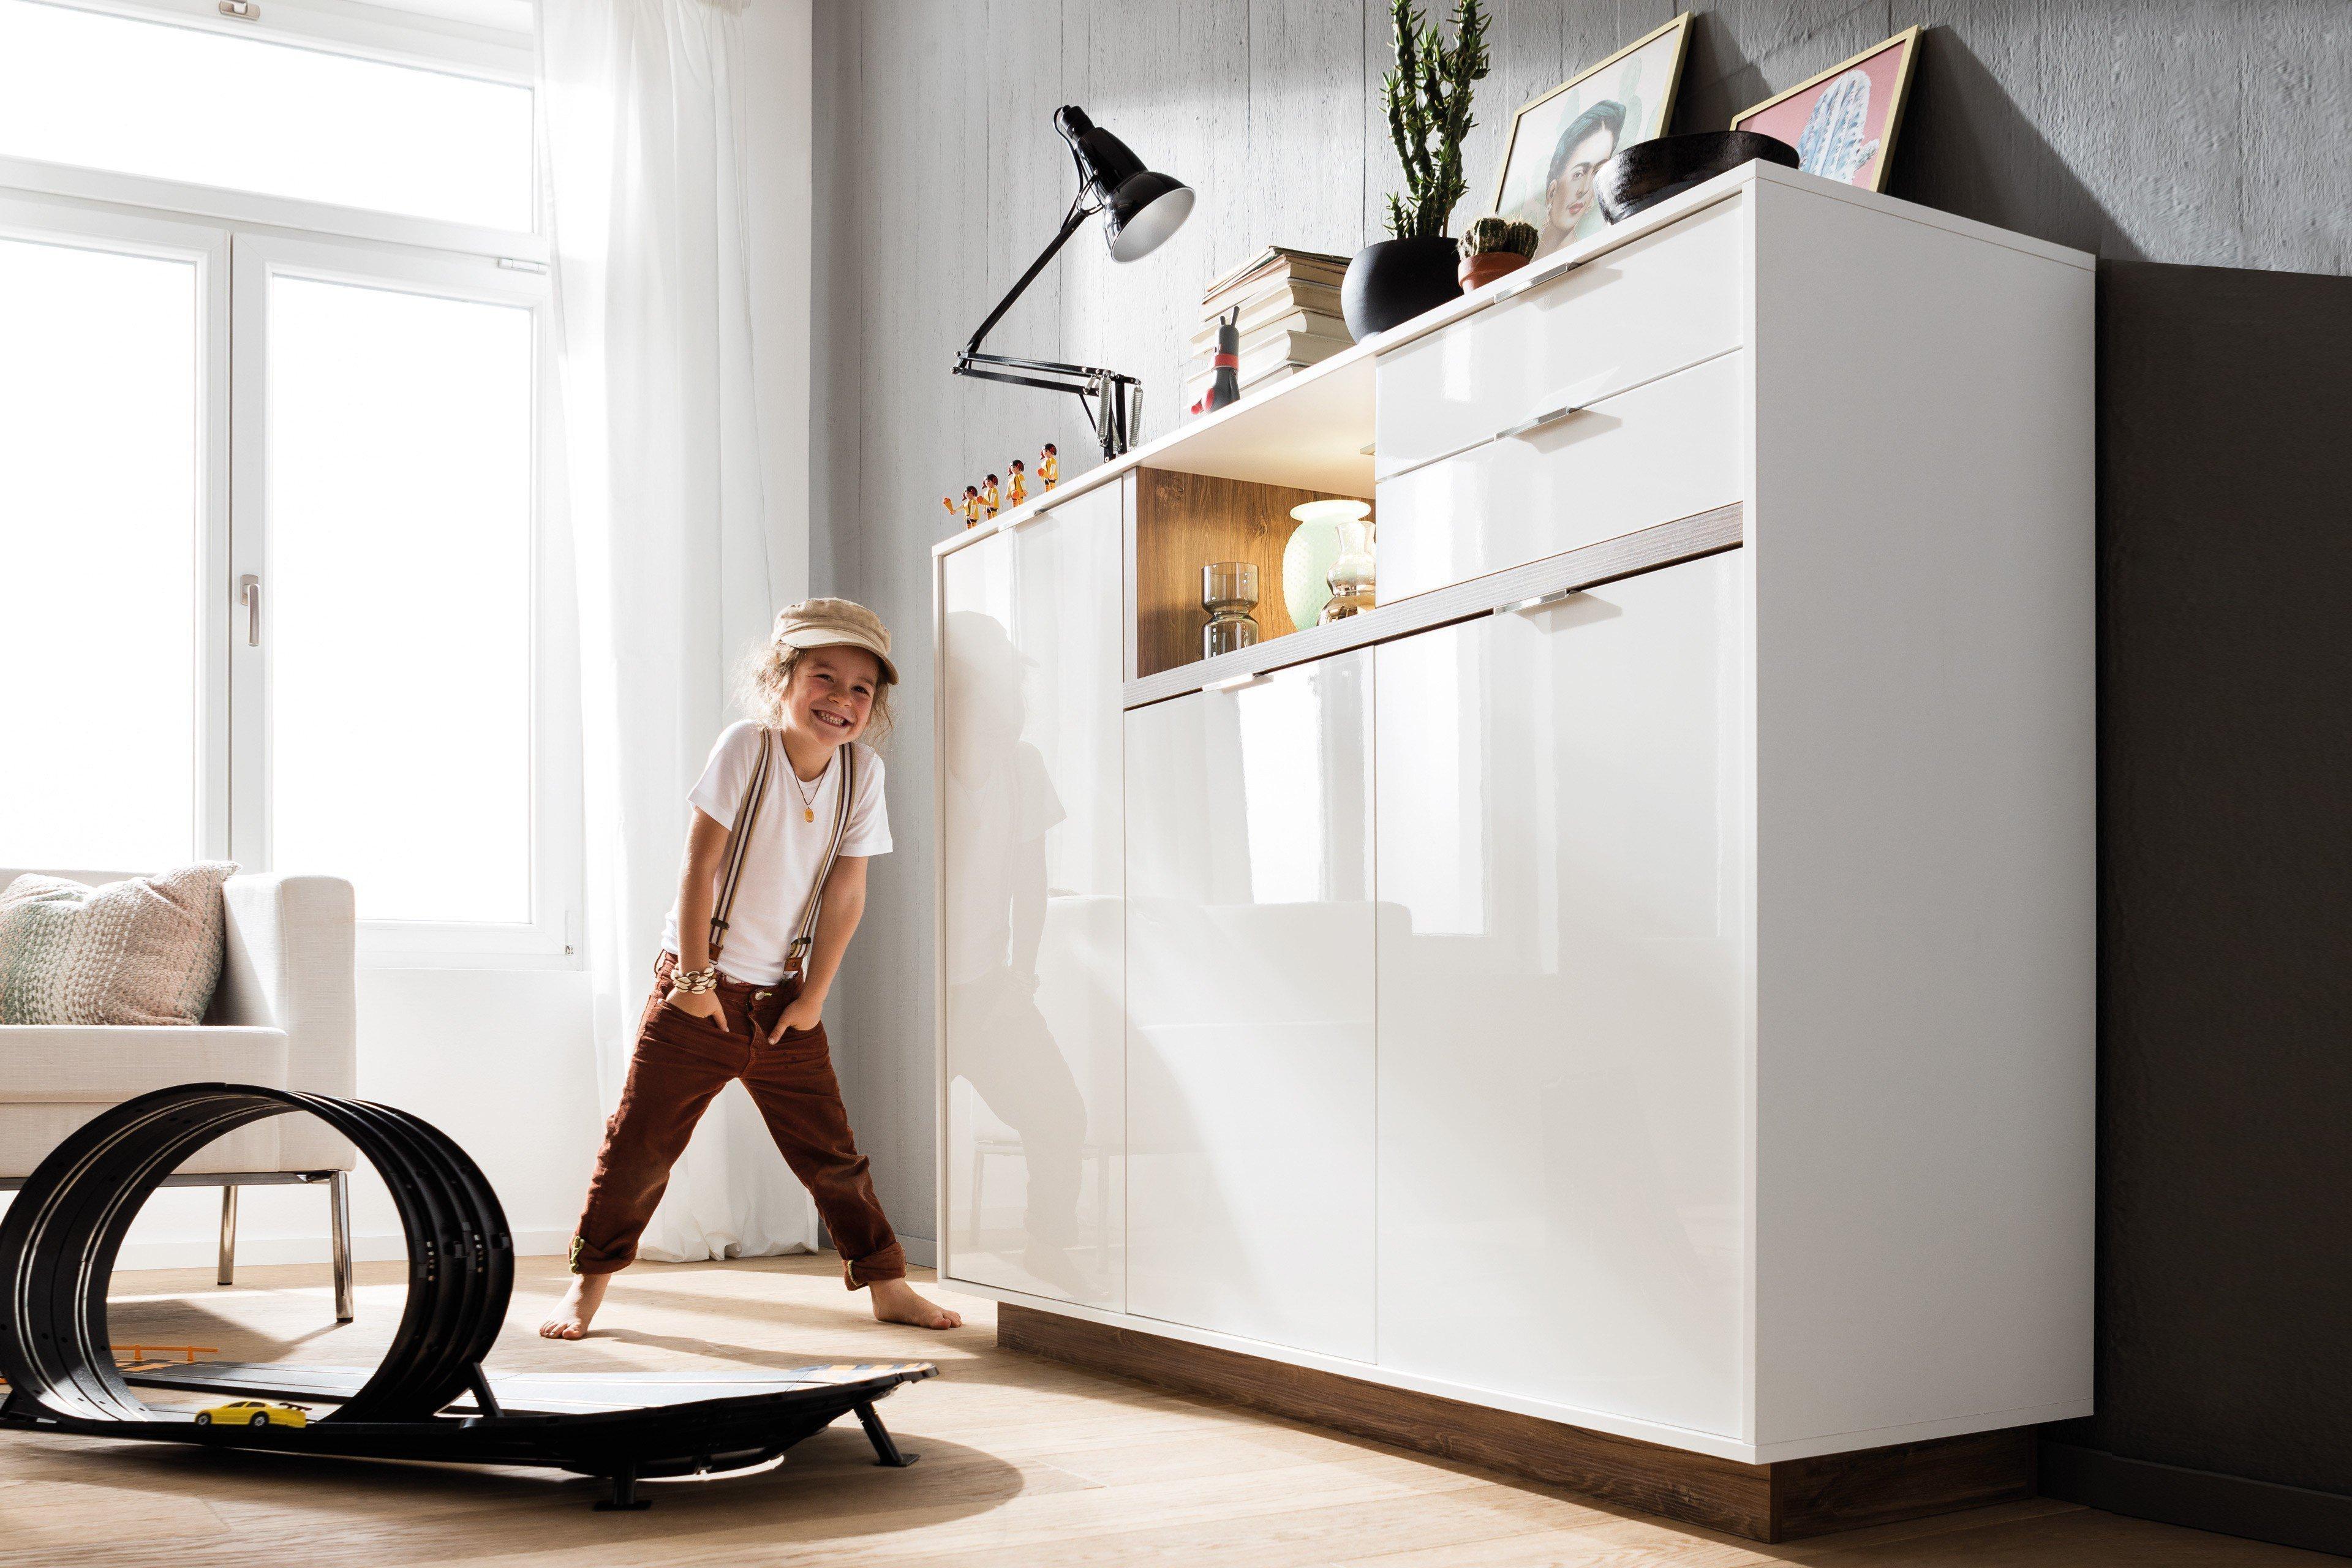 cs schmalm bel highboard my ell wei stirling eiche m bel letz ihr online shop. Black Bedroom Furniture Sets. Home Design Ideas